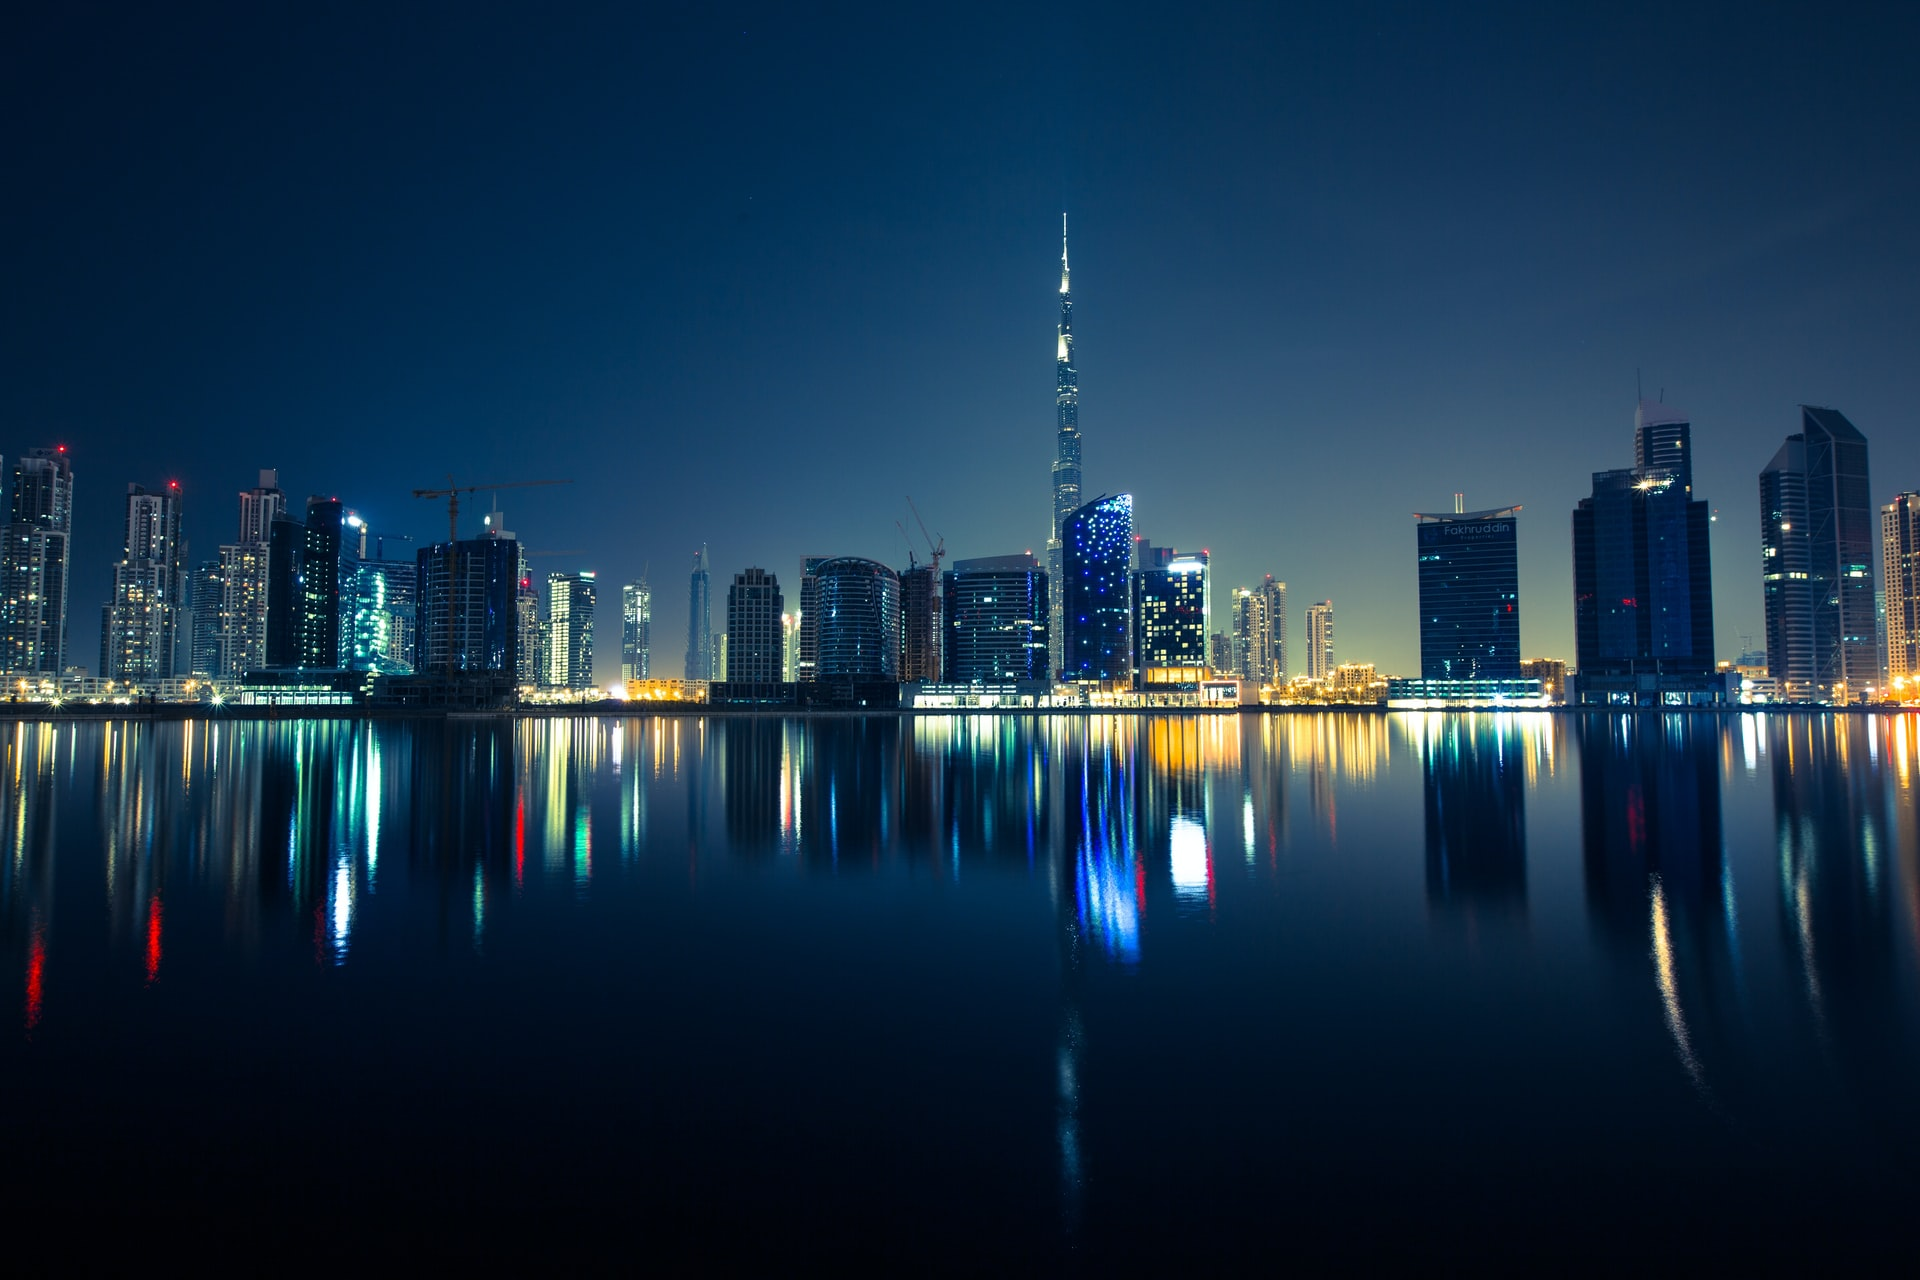 Dubai ranks among the safest cities in the world